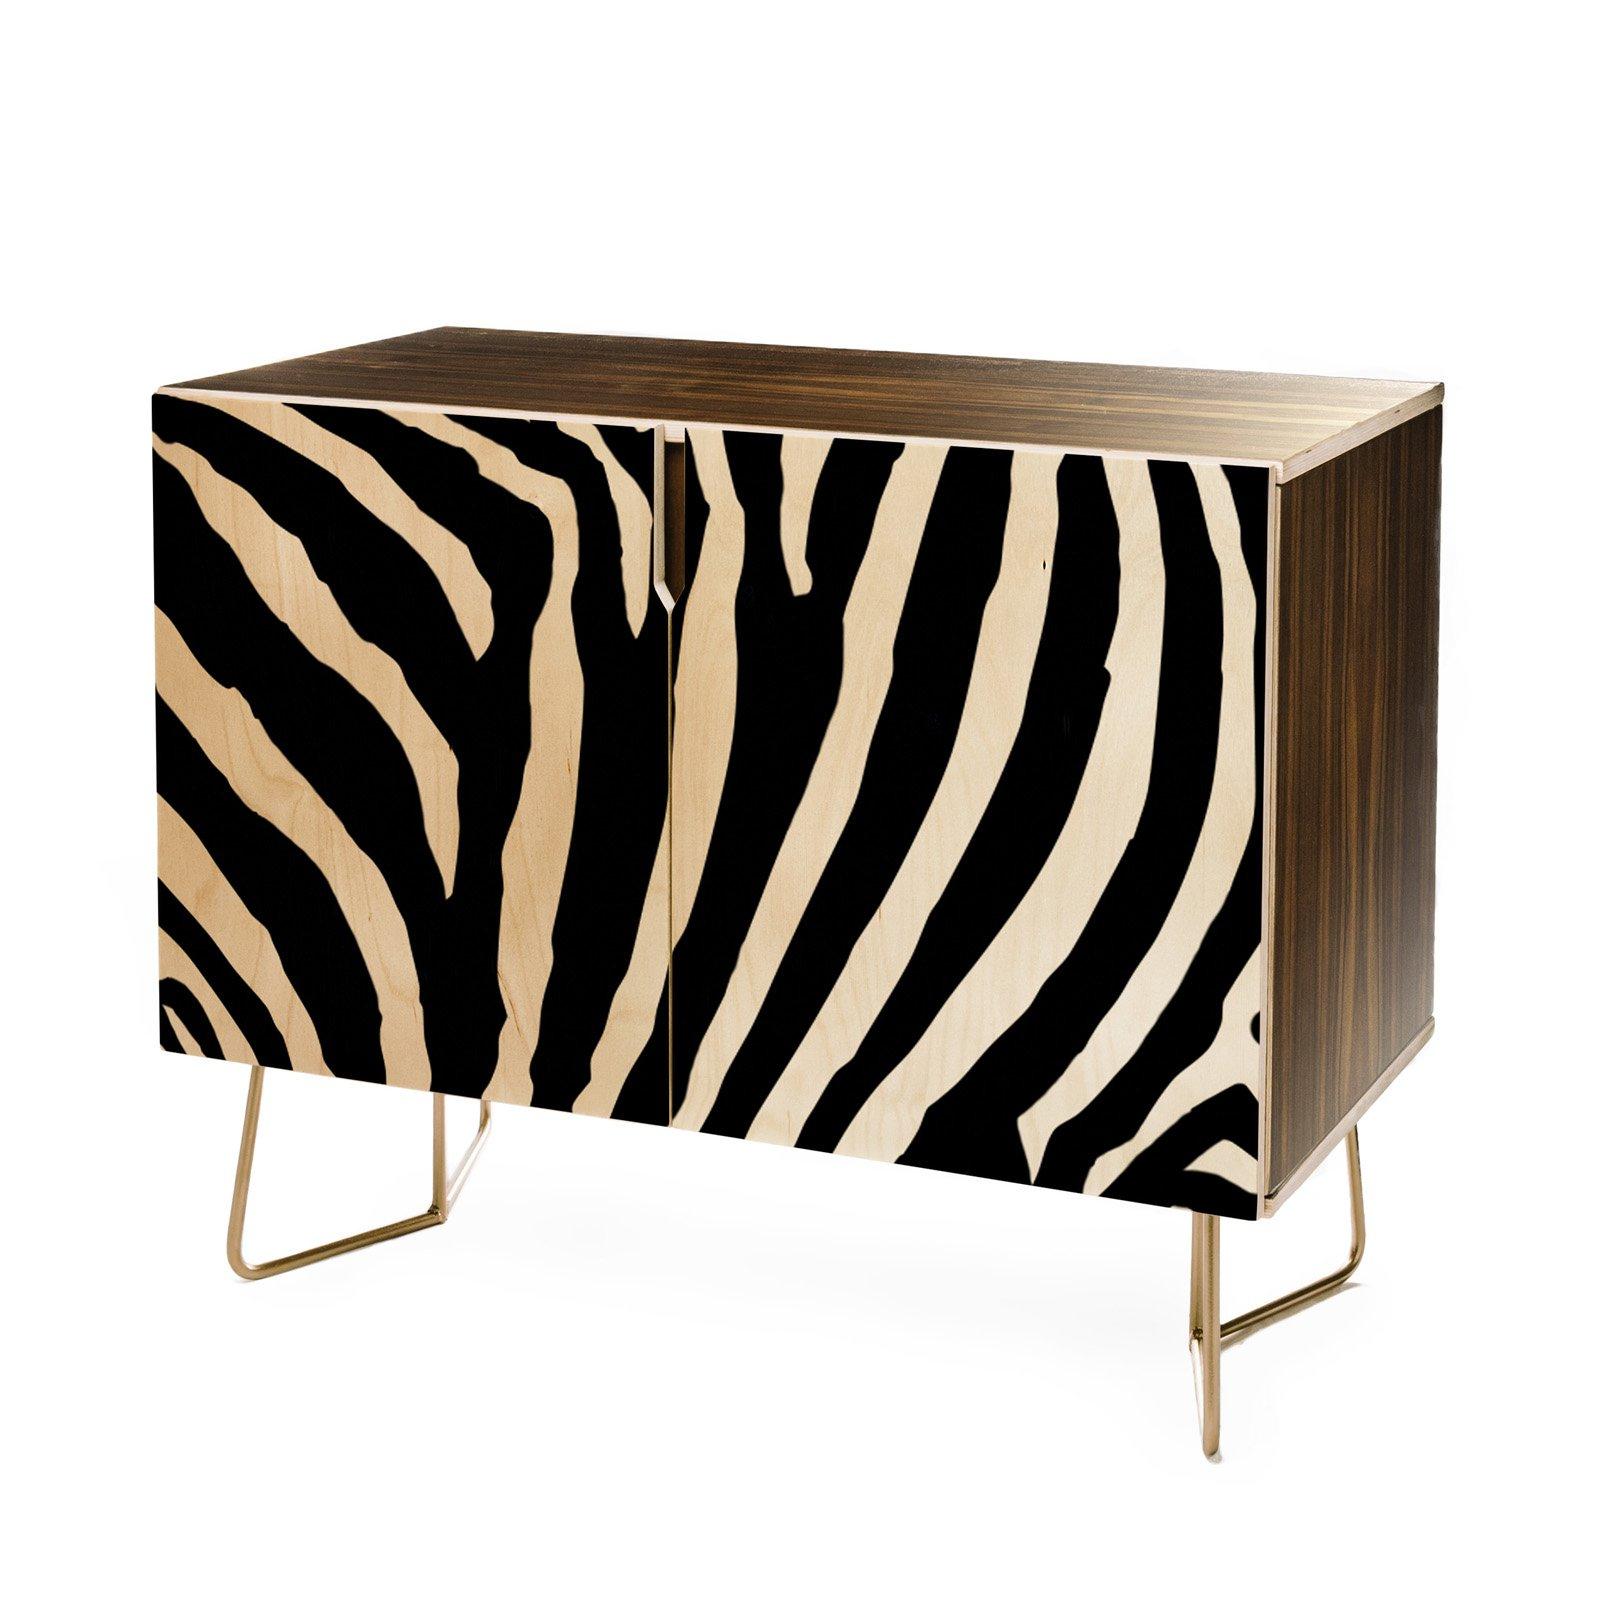 Deny Designs Natalie Baca Zebra Stripes Credenza | Products In Beach Stripes Credenzas (View 15 of 20)